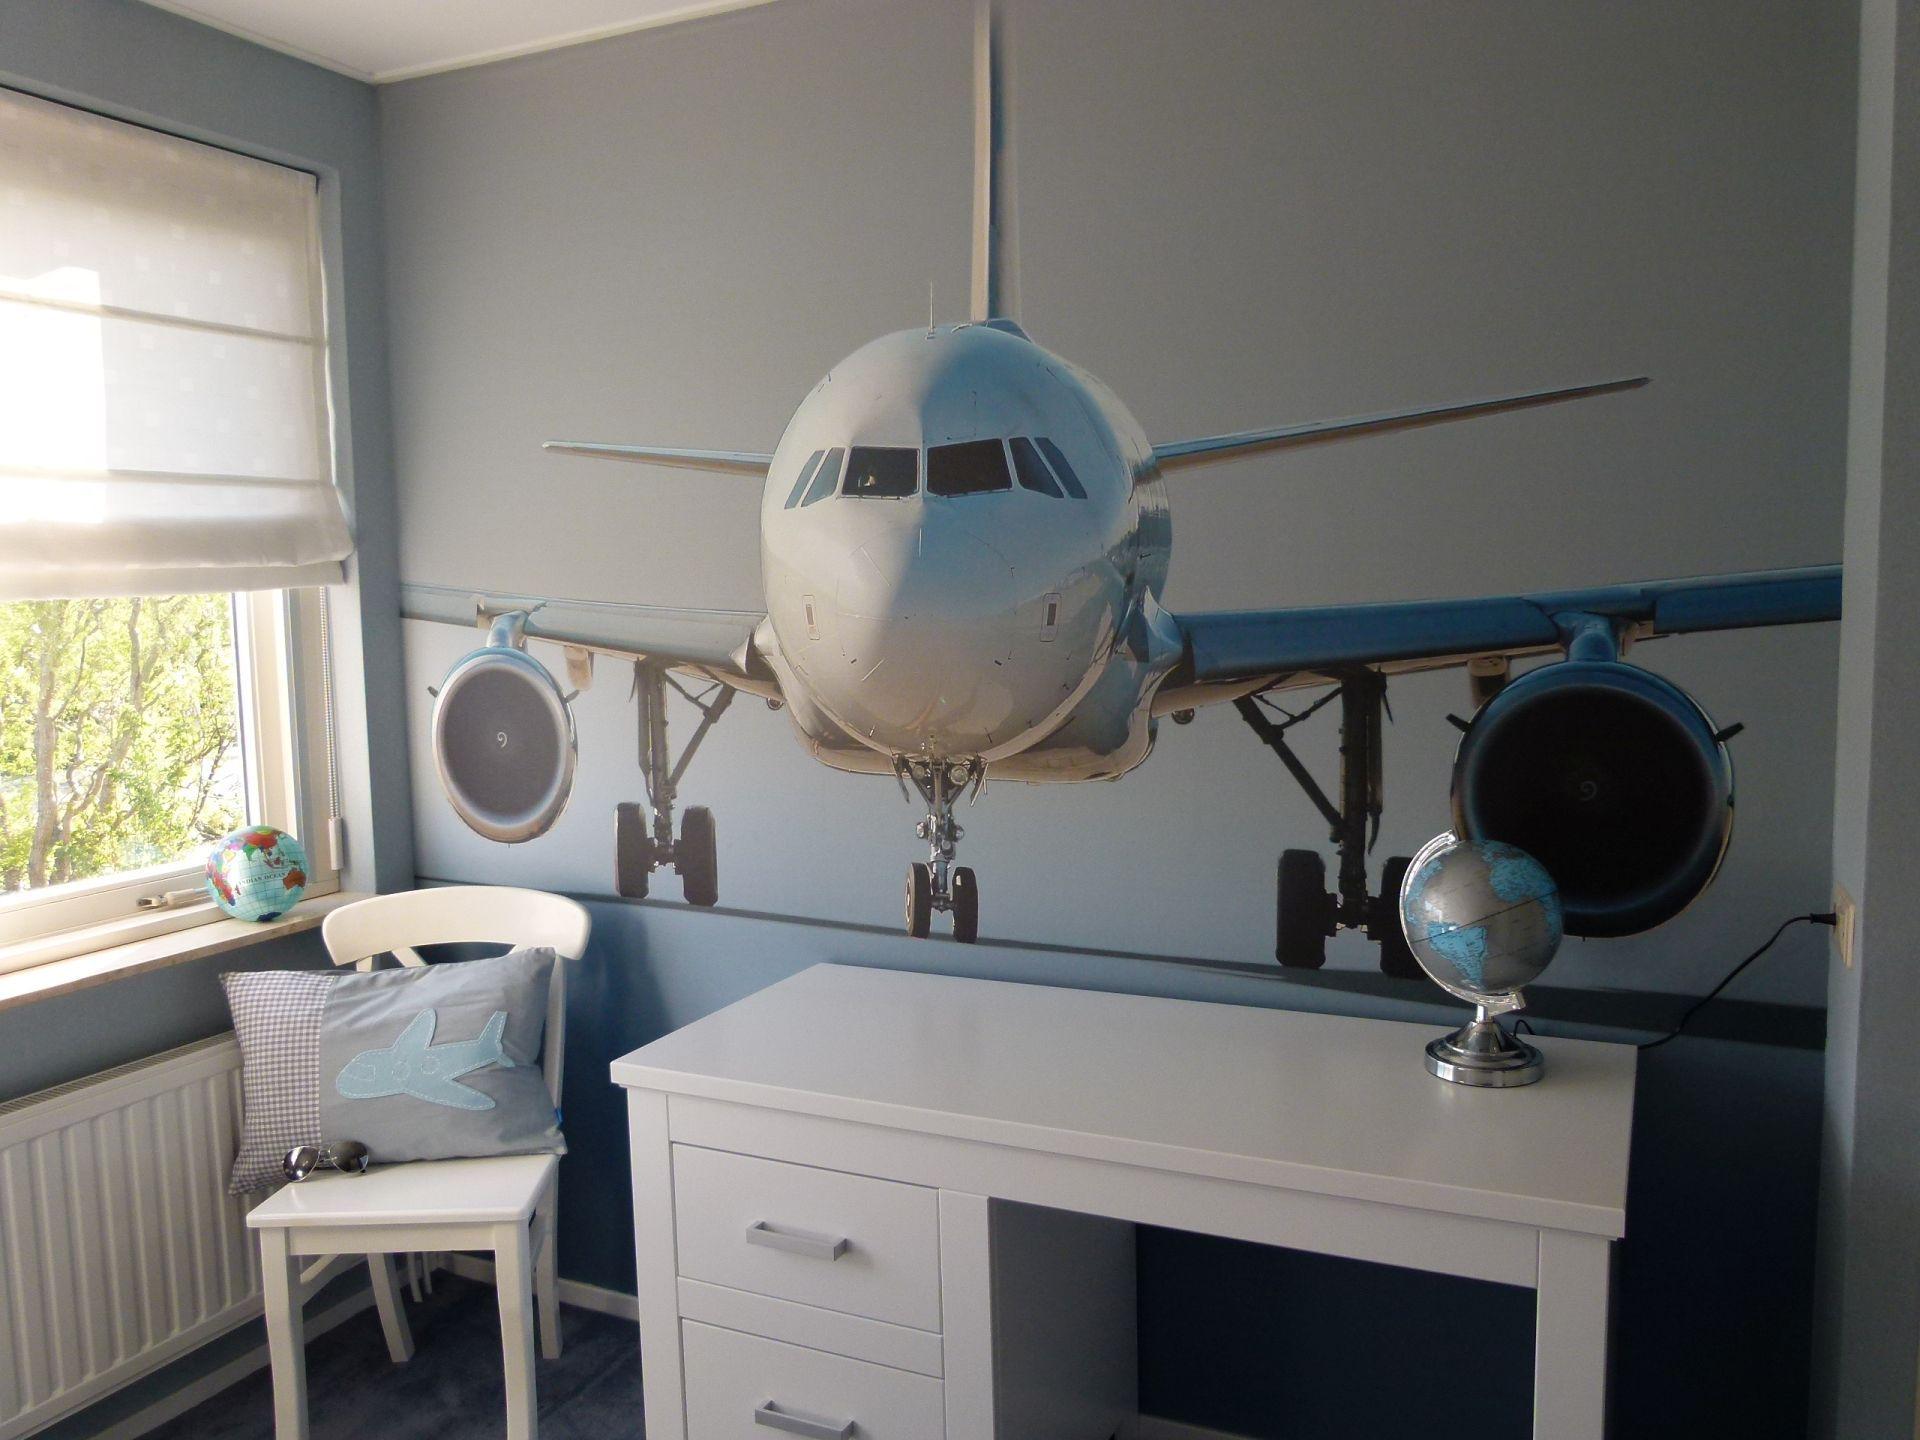 Behang Kinderkamer Grijs : Vliegtuig kinderkamer jongenskamer behang airplane vliegtuig